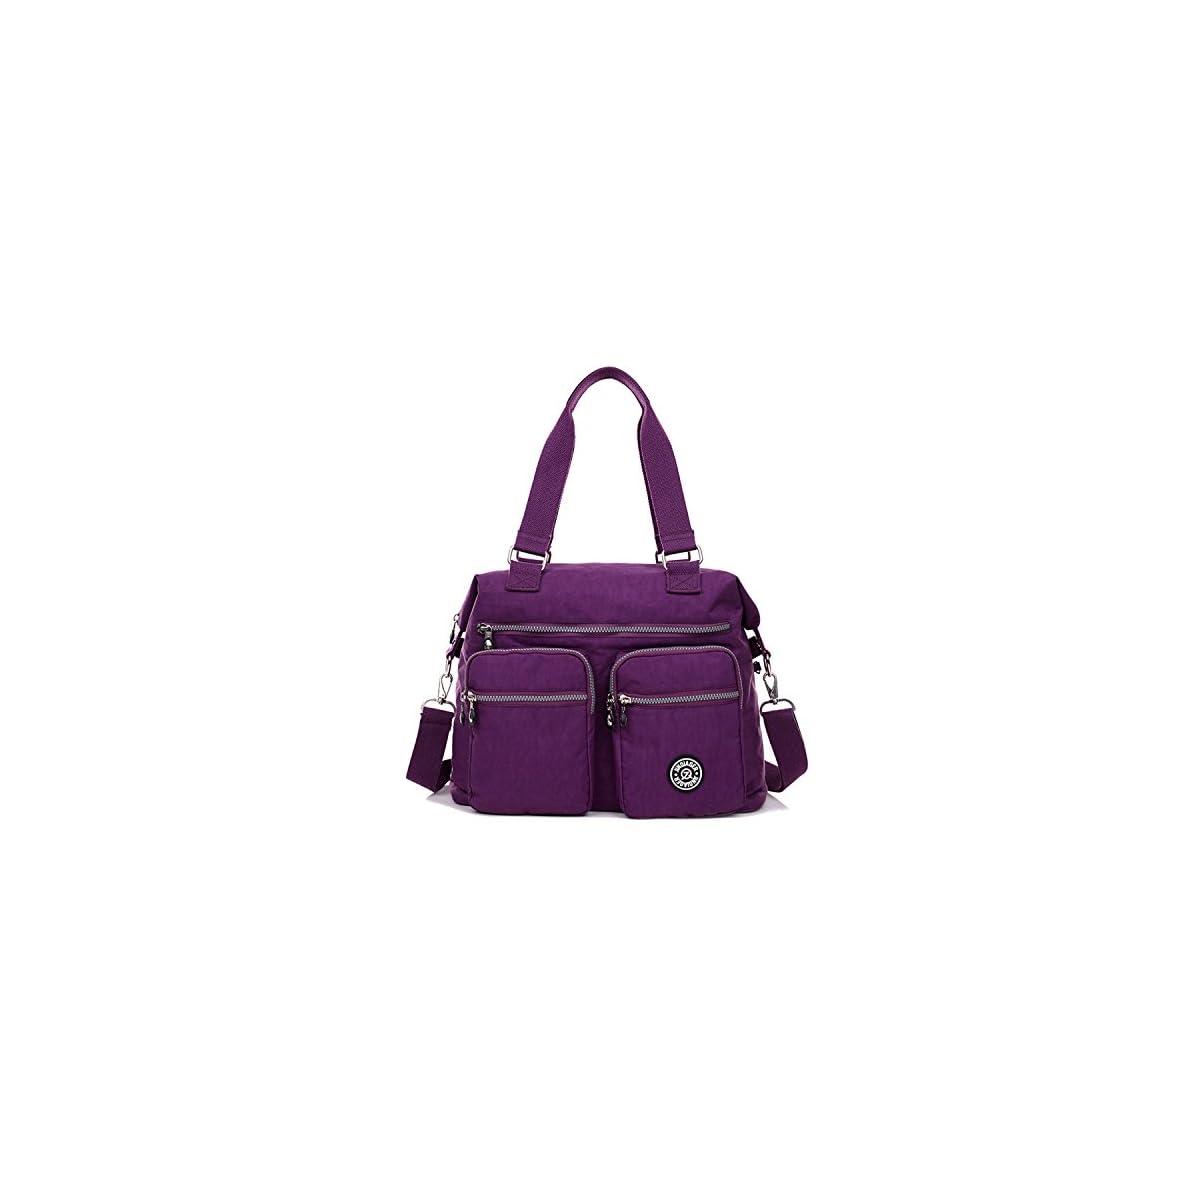 51jKxcT3MAL. SS1200  - Outreo Bolsos de Moda Mujer Messenger Bag Bolso Bandolera Bolsas de Viaje Escolares Impermeable Bolsos Baratos Mano para Tablet Sport Nylon